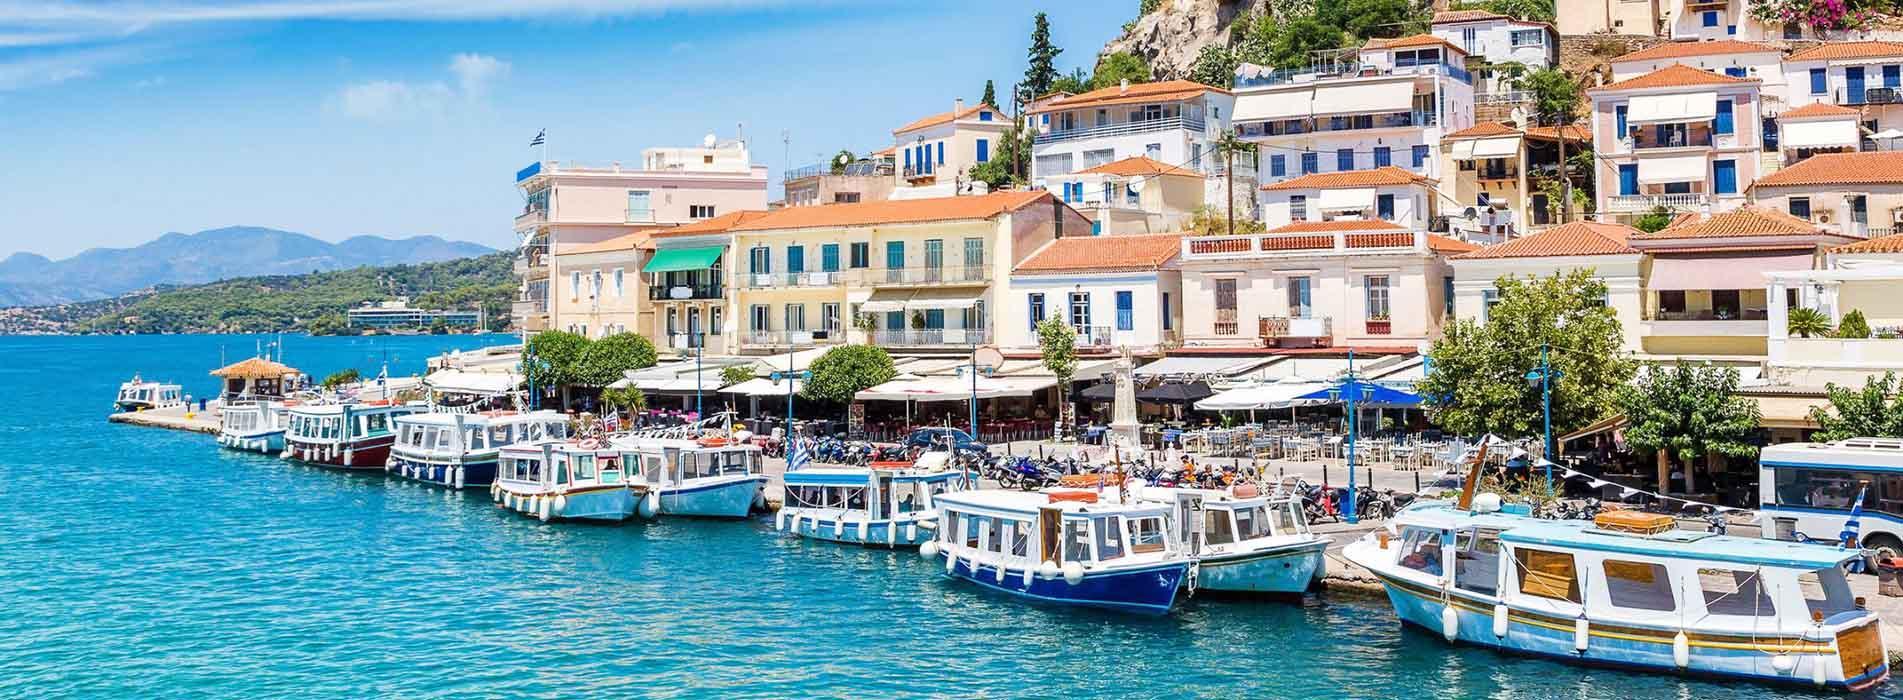 Greece - Poros 3 (main)